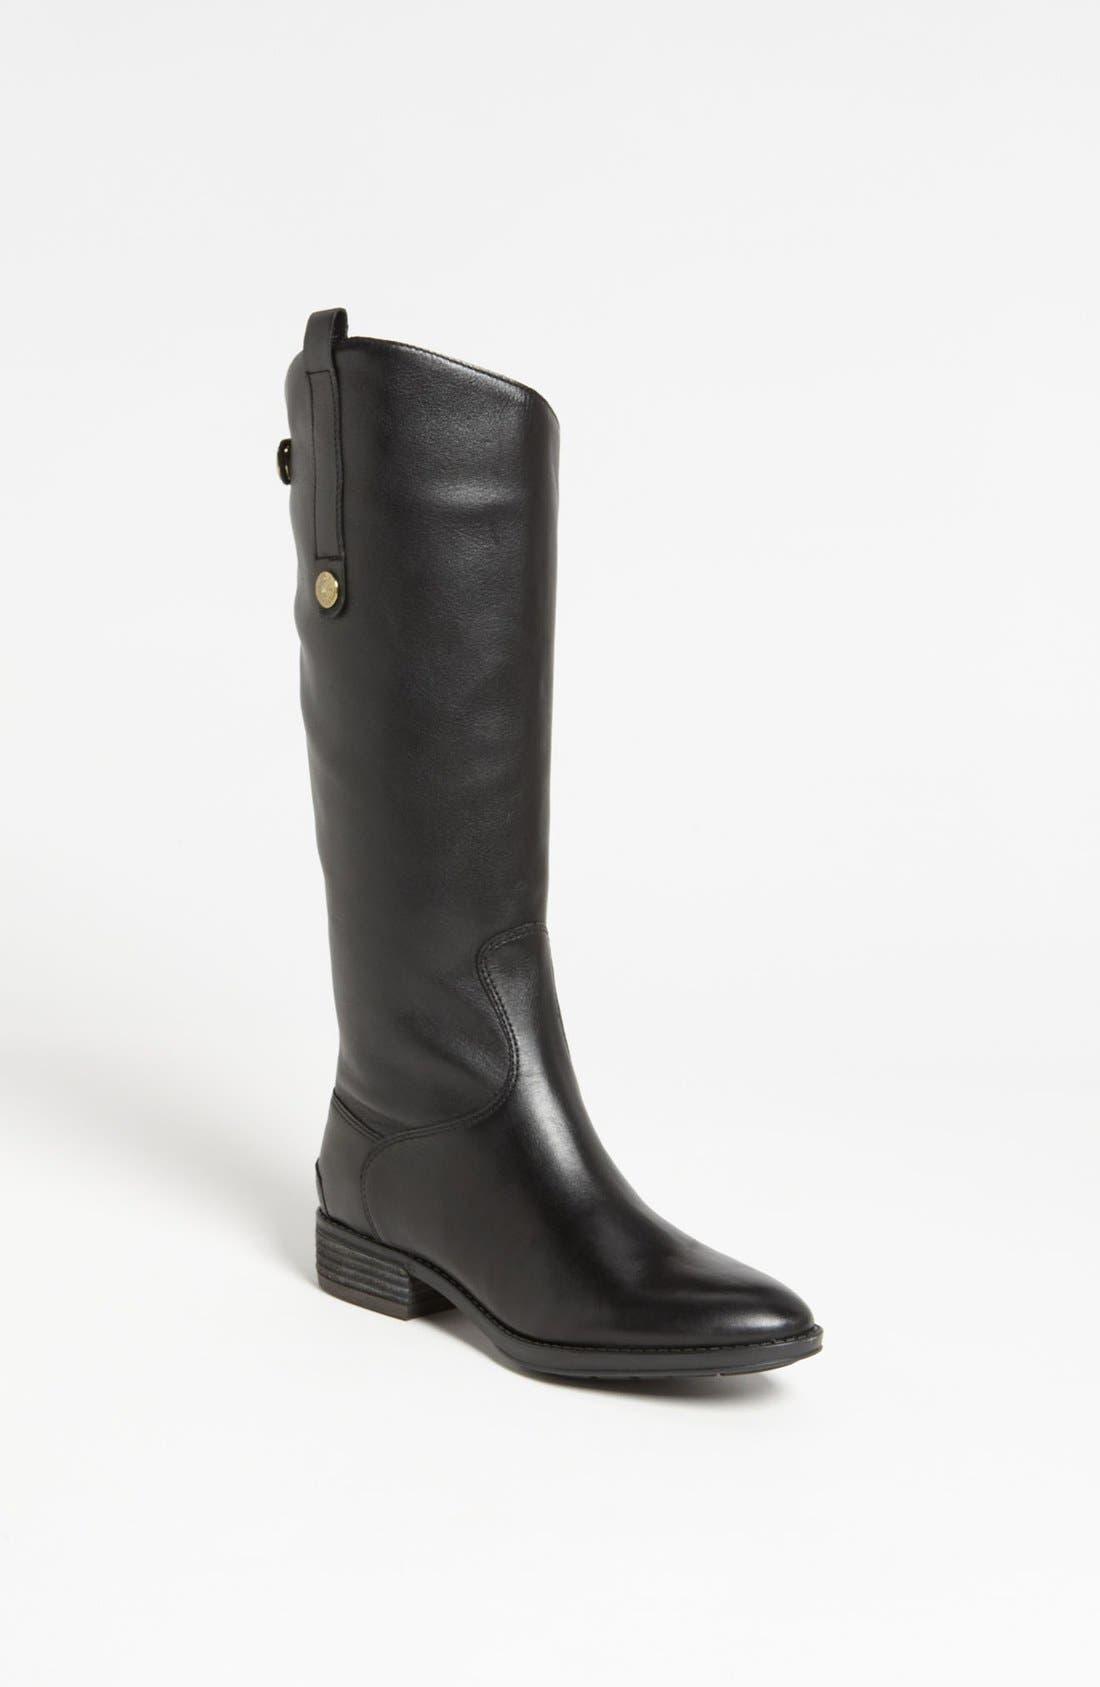 Main Image - Sam Edelman 'Penny' Boot (Women) (Wide Calf)